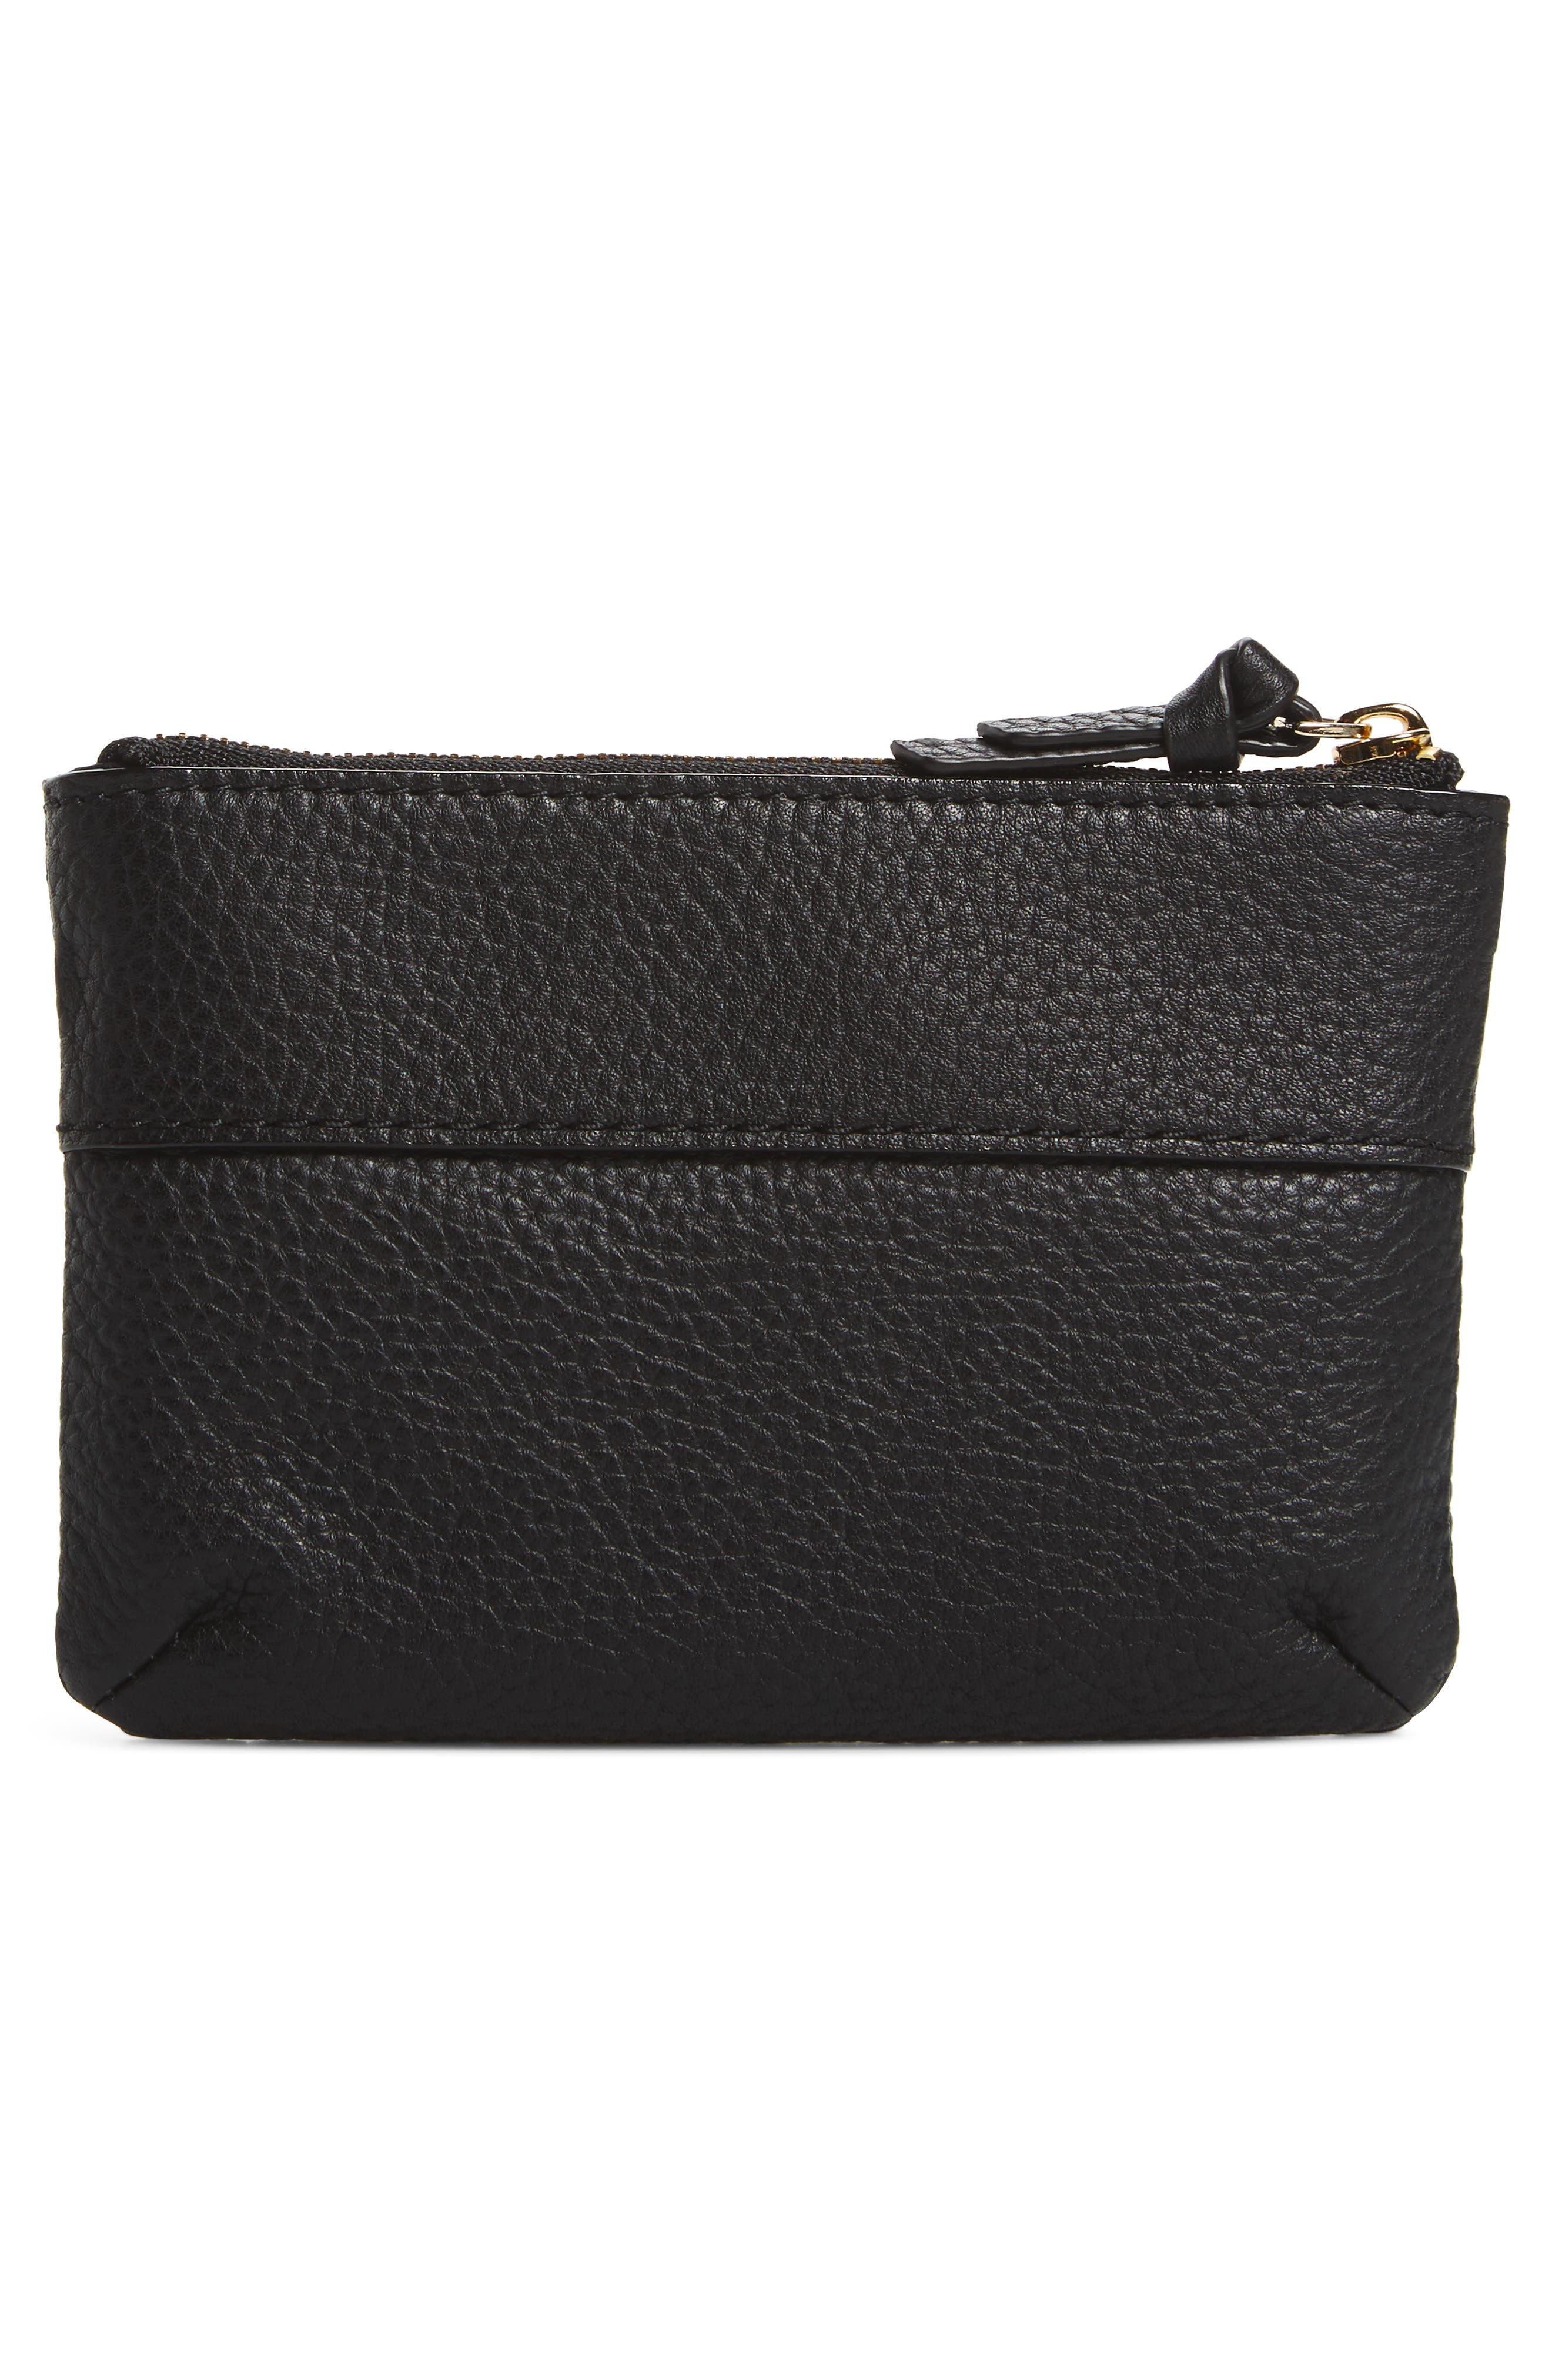 jackson street mila leather zip pouch,                             Alternate thumbnail 4, color,                             001